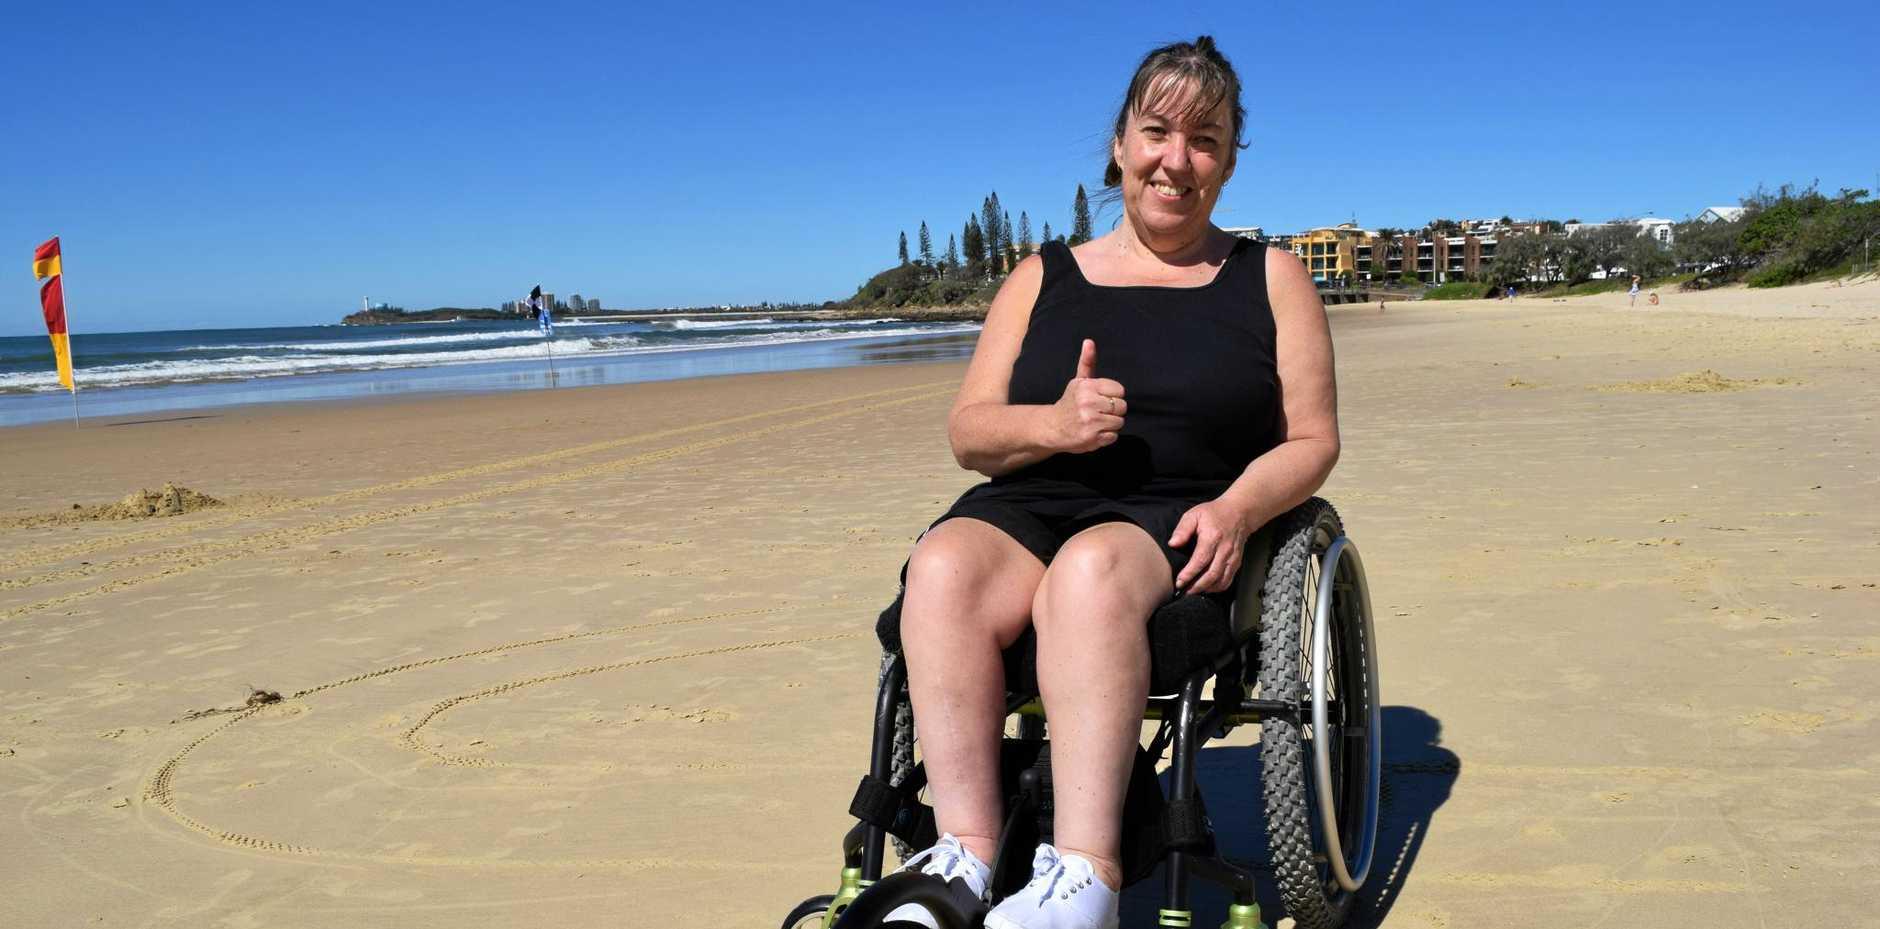 STOKED: Tania Sherley was ecstatic to use the disability access beach mat at Alexandra Headland.